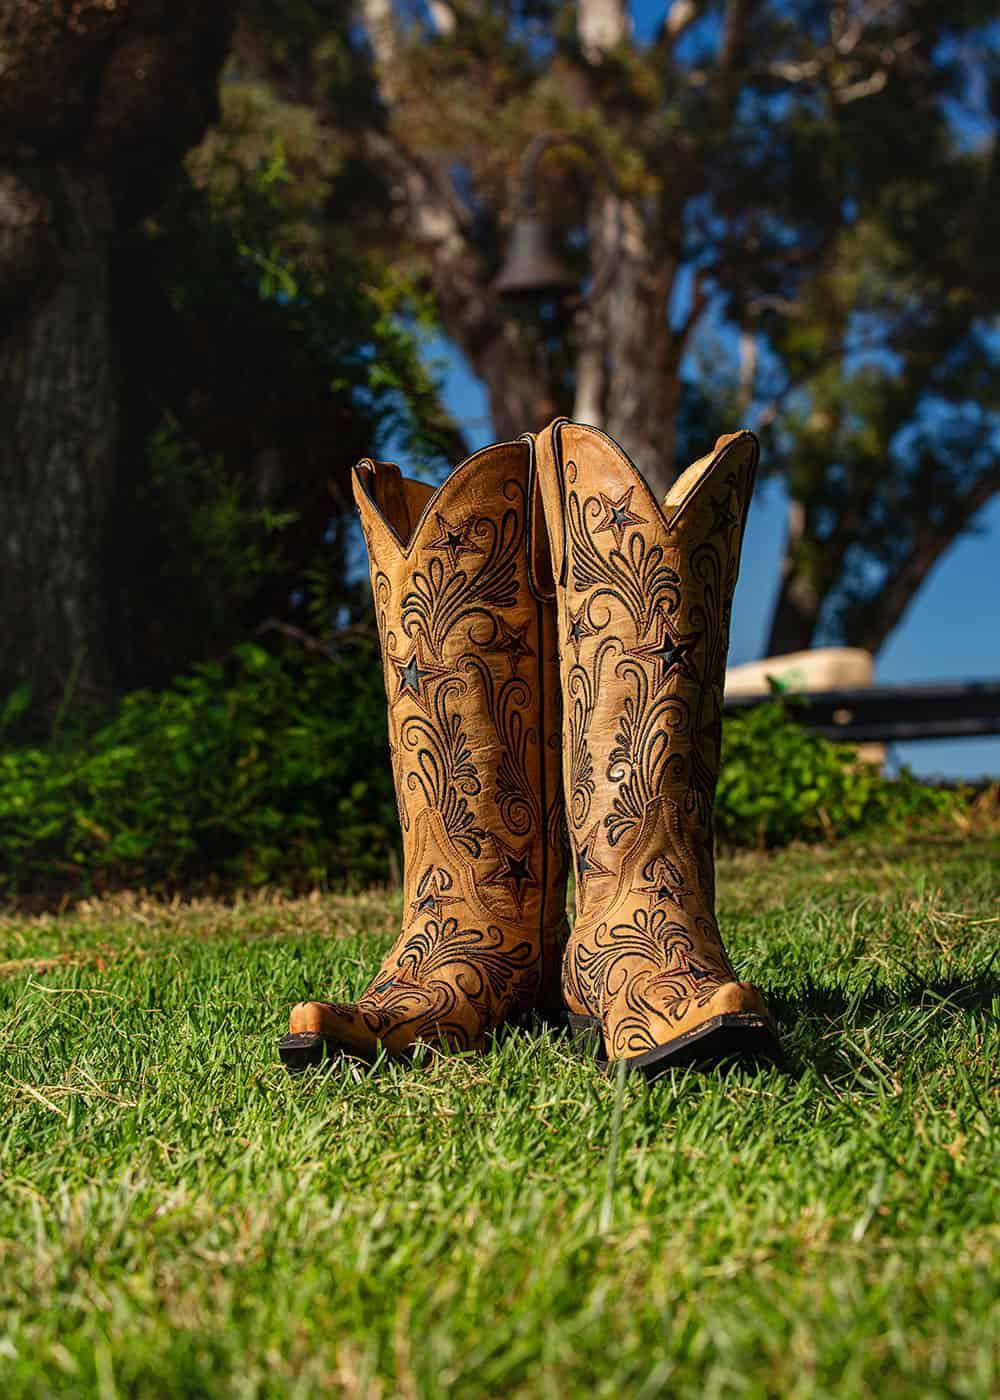 blaze old gringo yippee ki yay boot cowgirl magazine